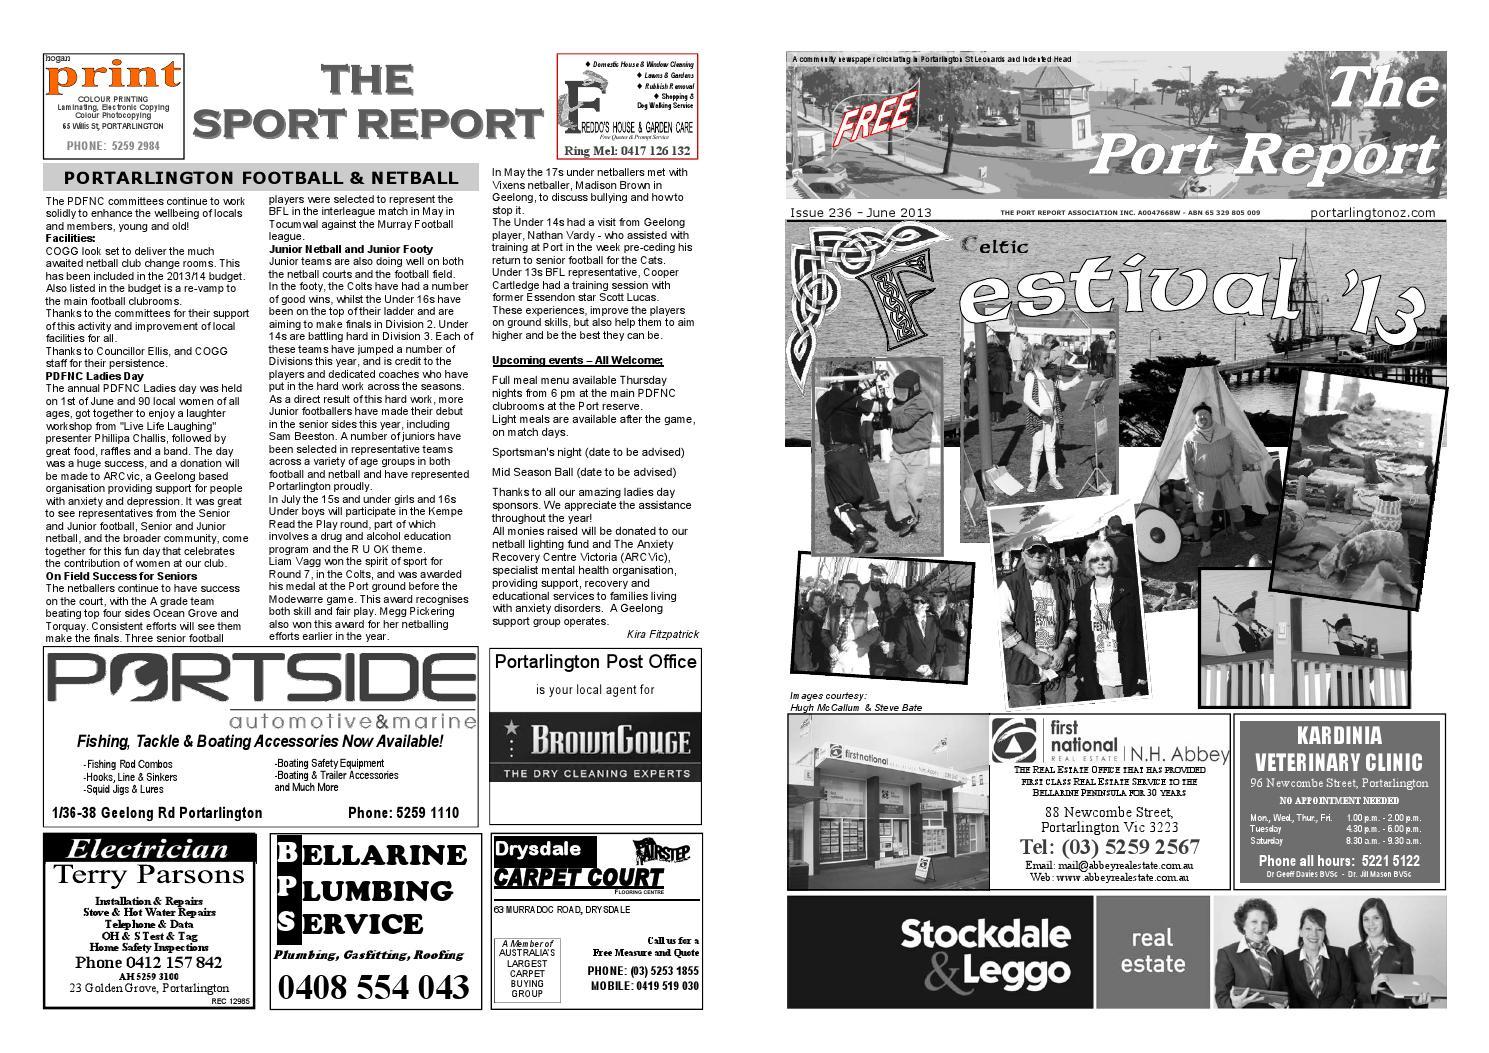 236. Port Report June 2013 by The Port Report - issuu 4f52b6d3cb586